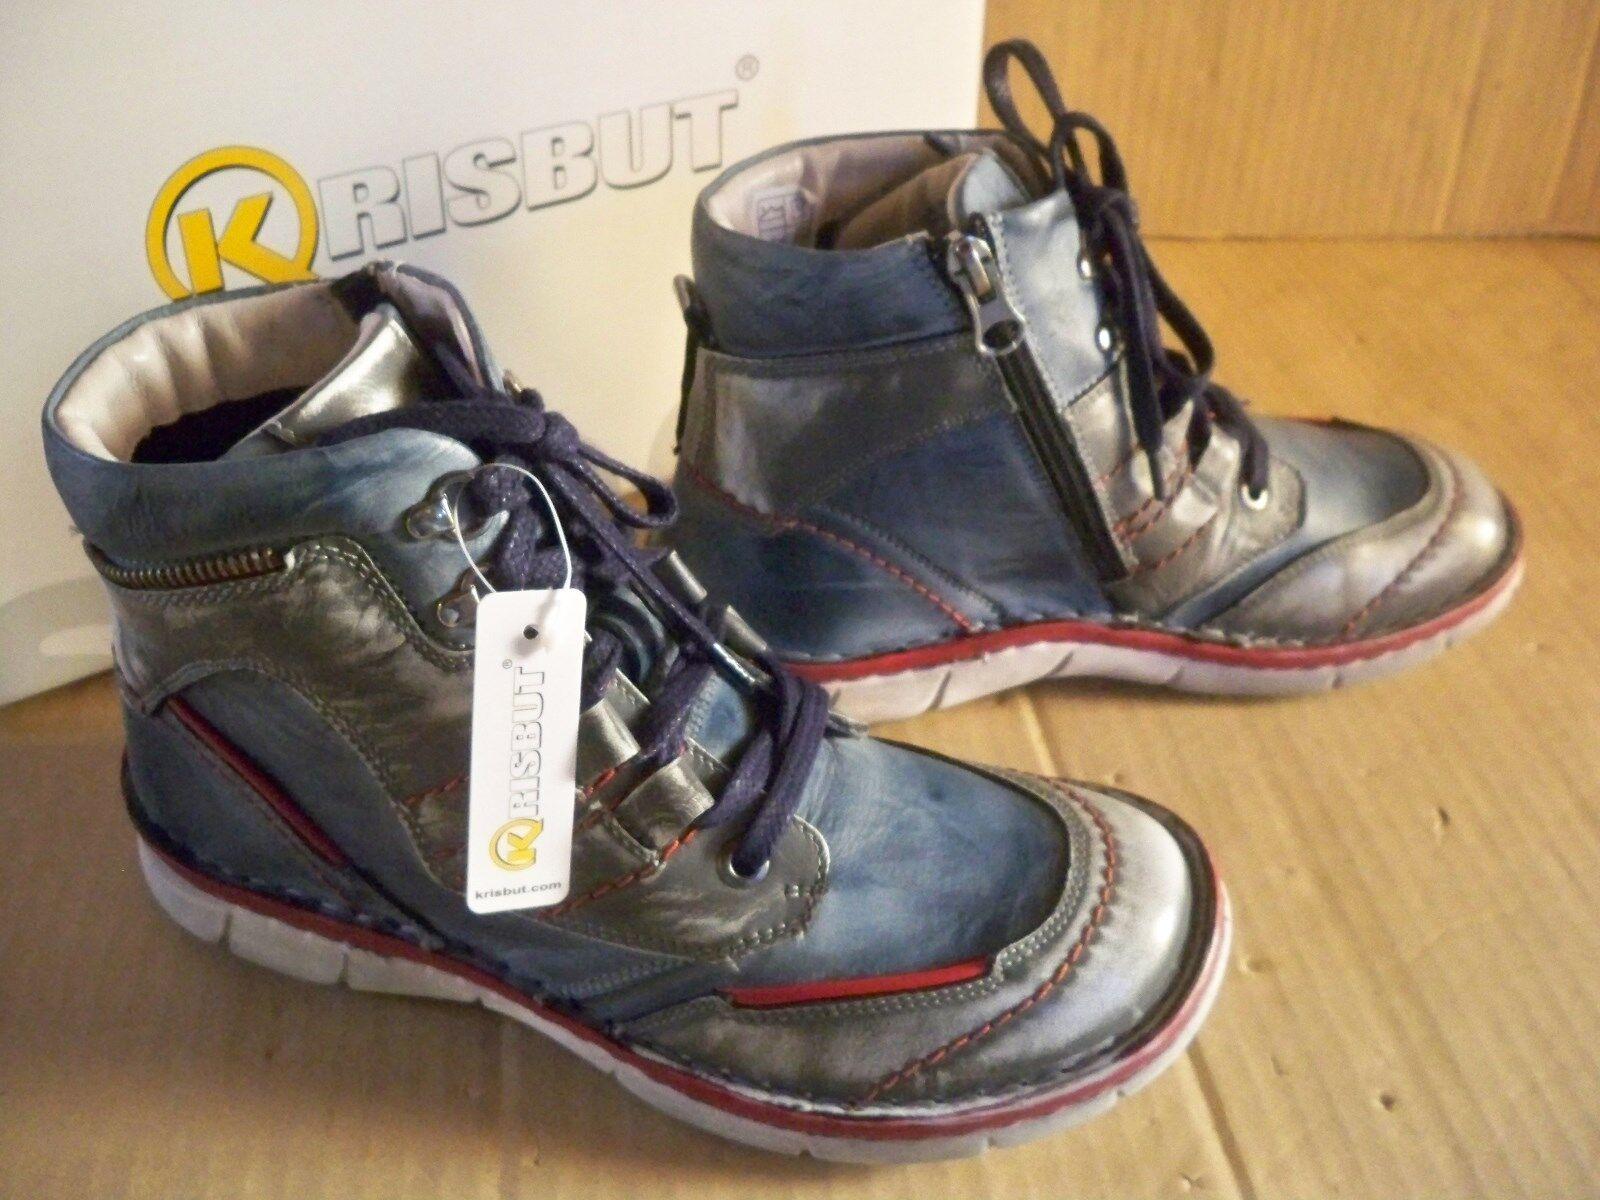 Krisbut Krisbut Krisbut señora botas azul talla 36 3073-4-4 lotes suela interior ligero forraje 9547f4